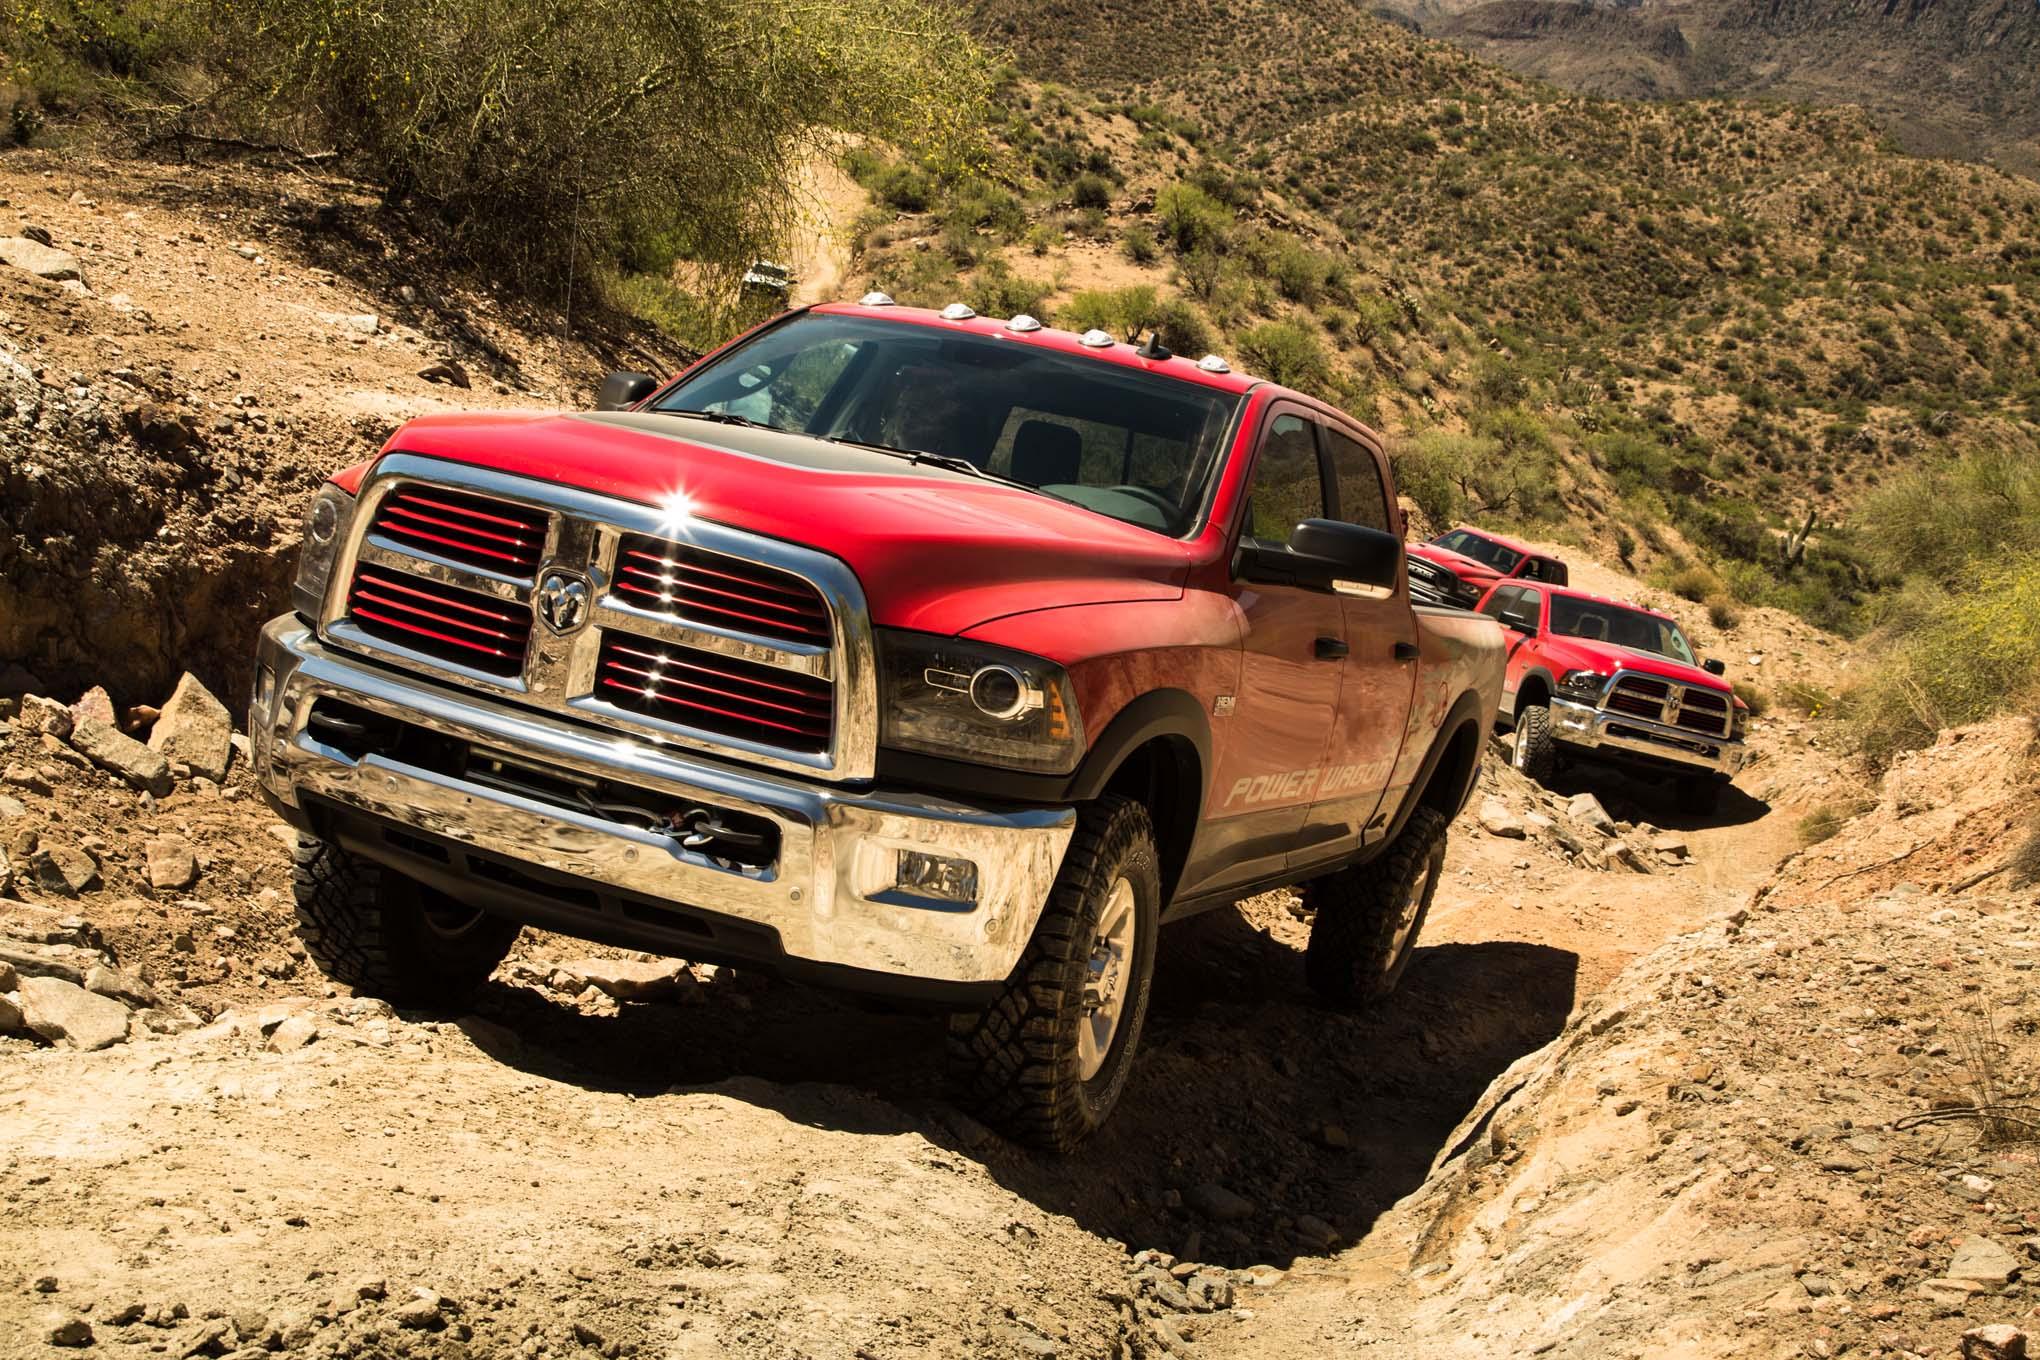 Overlanding With The 2016 Ram Rebel 1500 And Ram Power Wagon